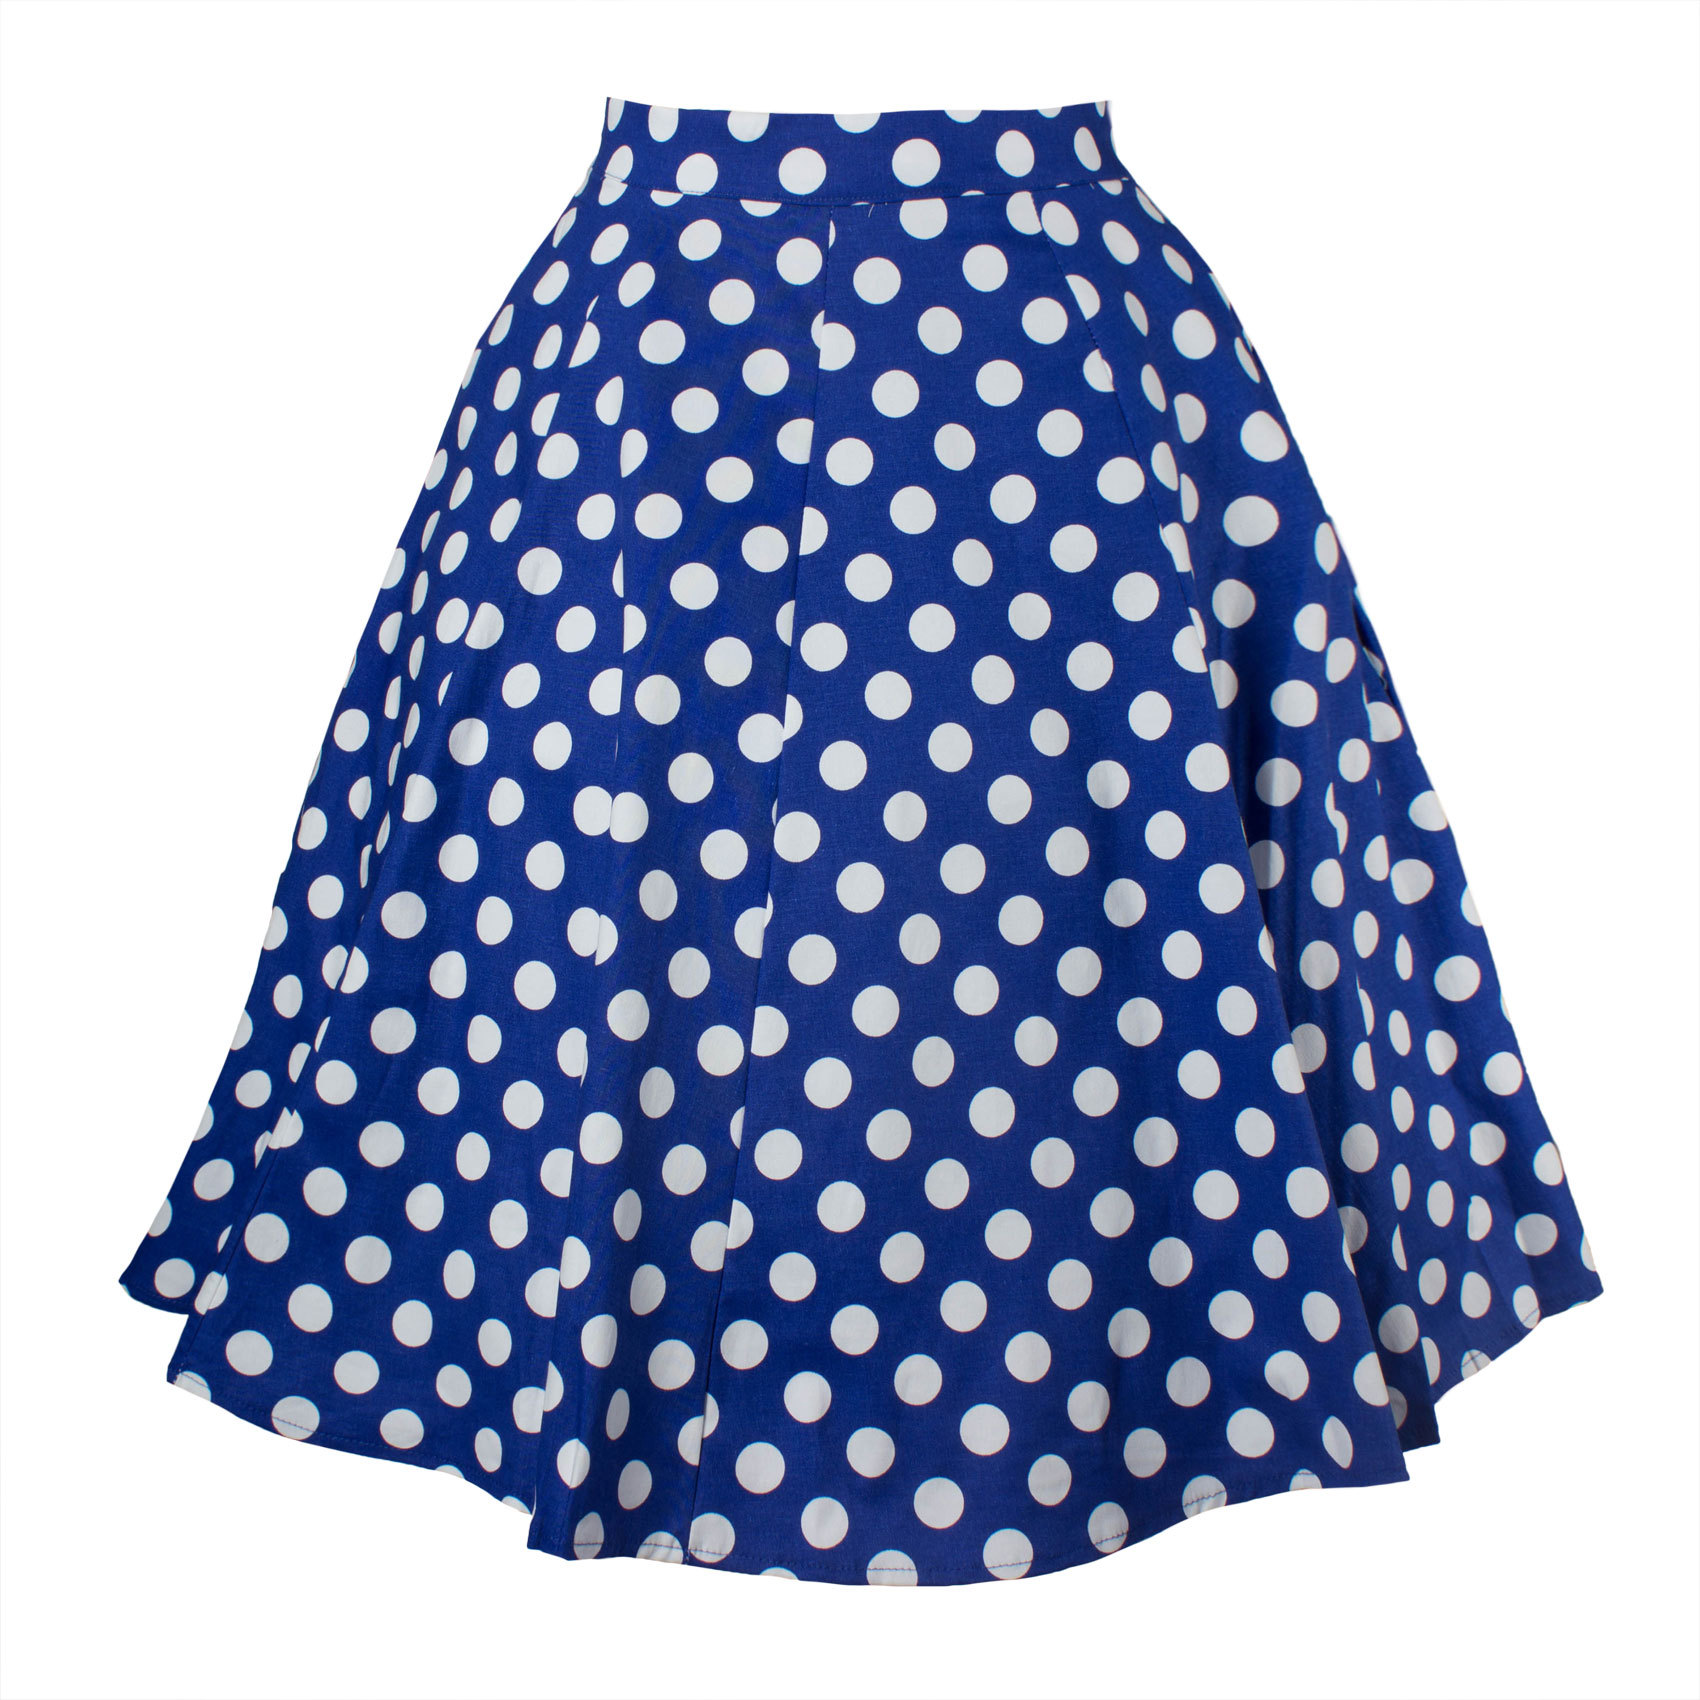 Madam Clothing OWLPRINCESS  Women's 2020 Autumn Retro Polka Dot Skirt